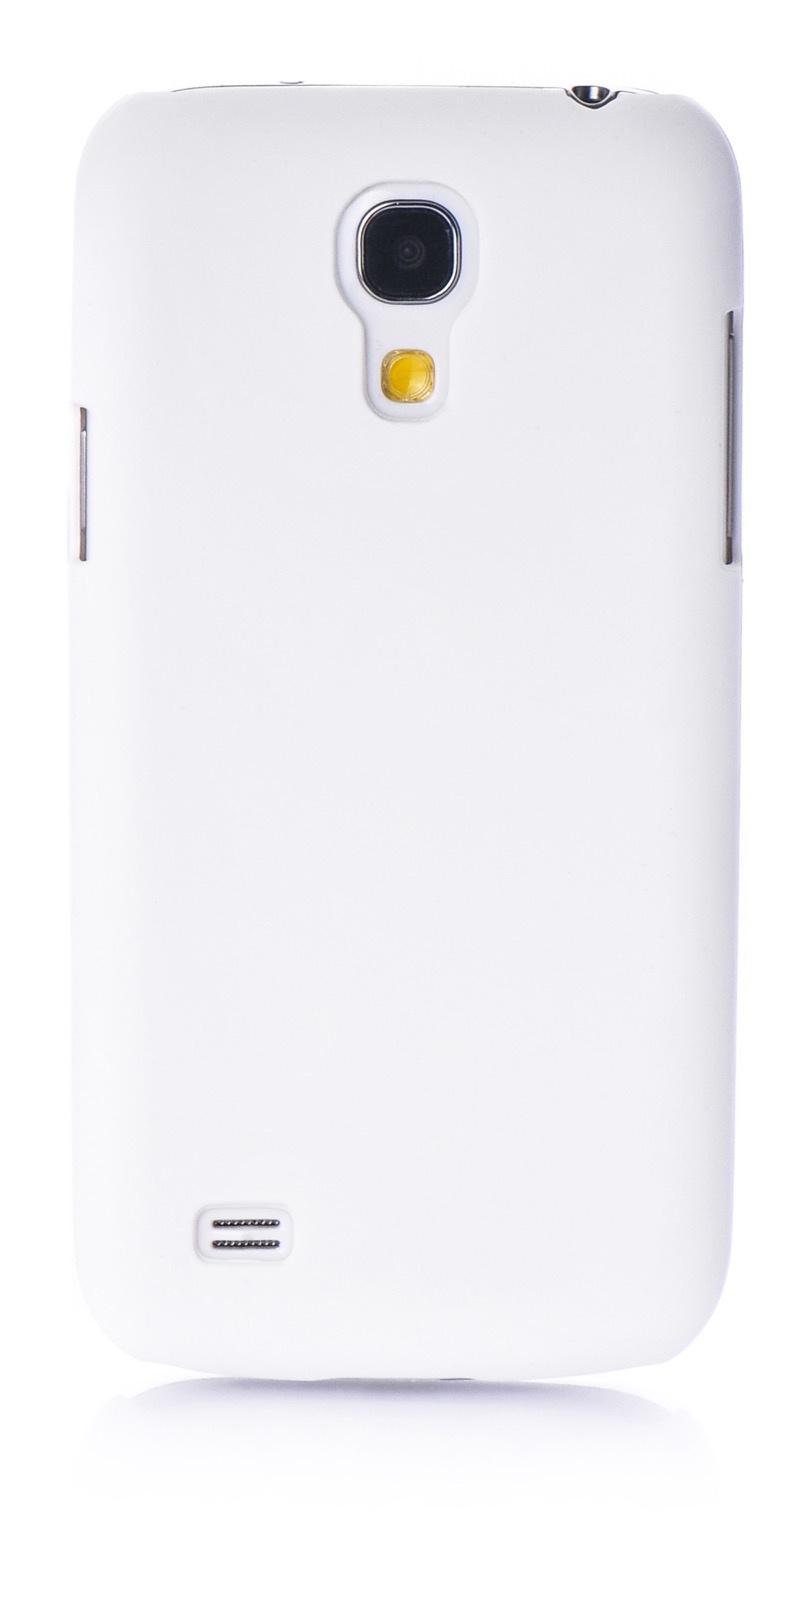 Чехол для сотового телефона iNeez накладка пластик soft touch для Samsung Galaxy S4 mini, белый